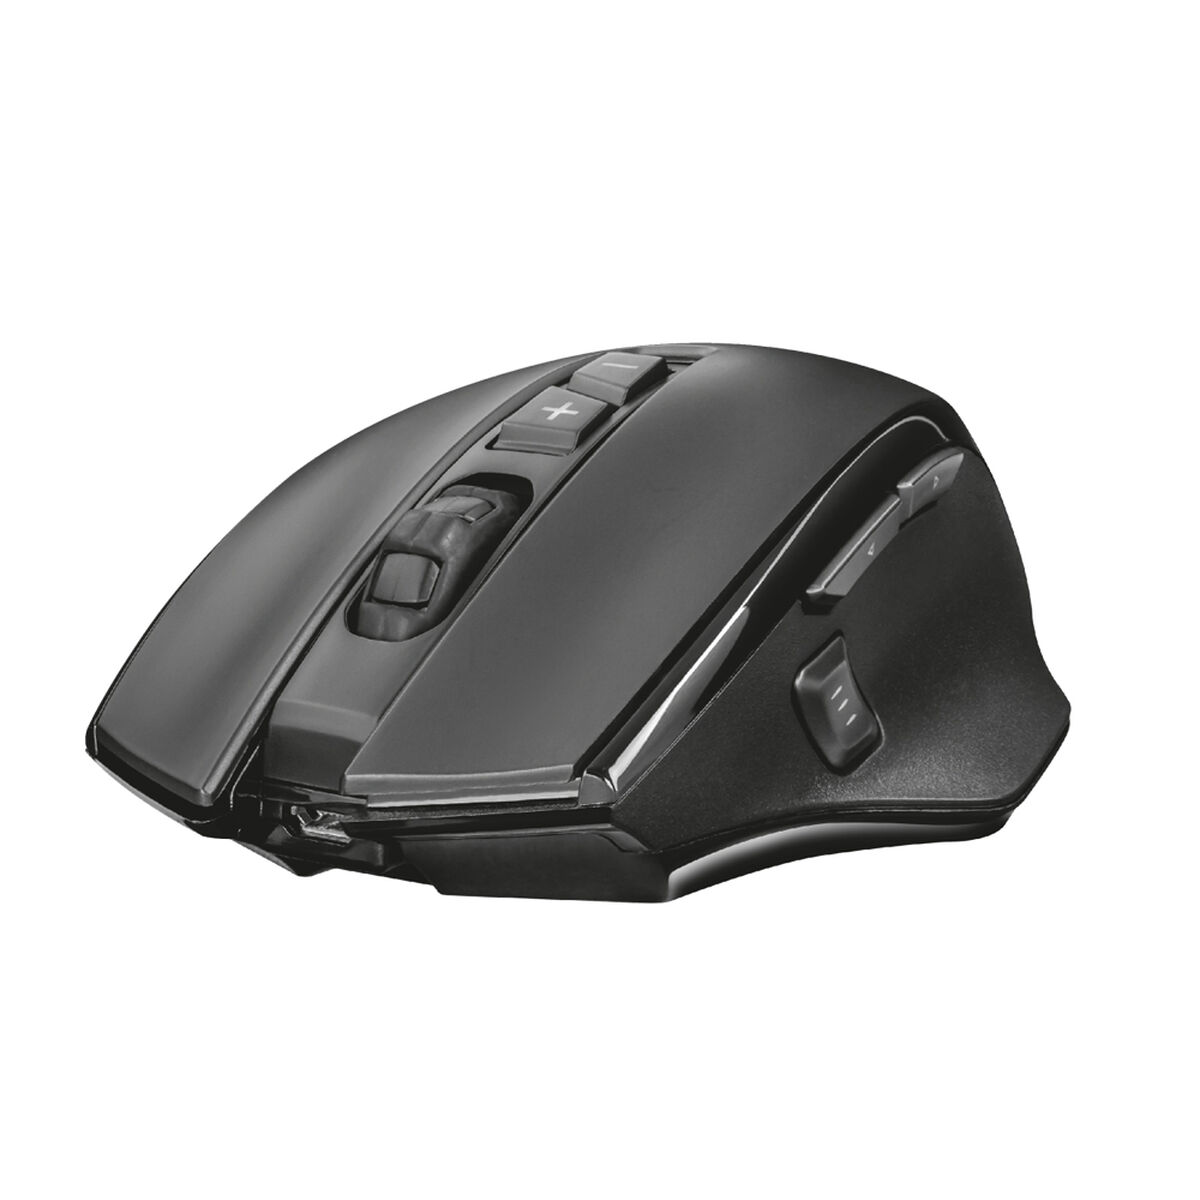 Mouse Gamer Inalámbrico Recargable GXT140 Manx Trust